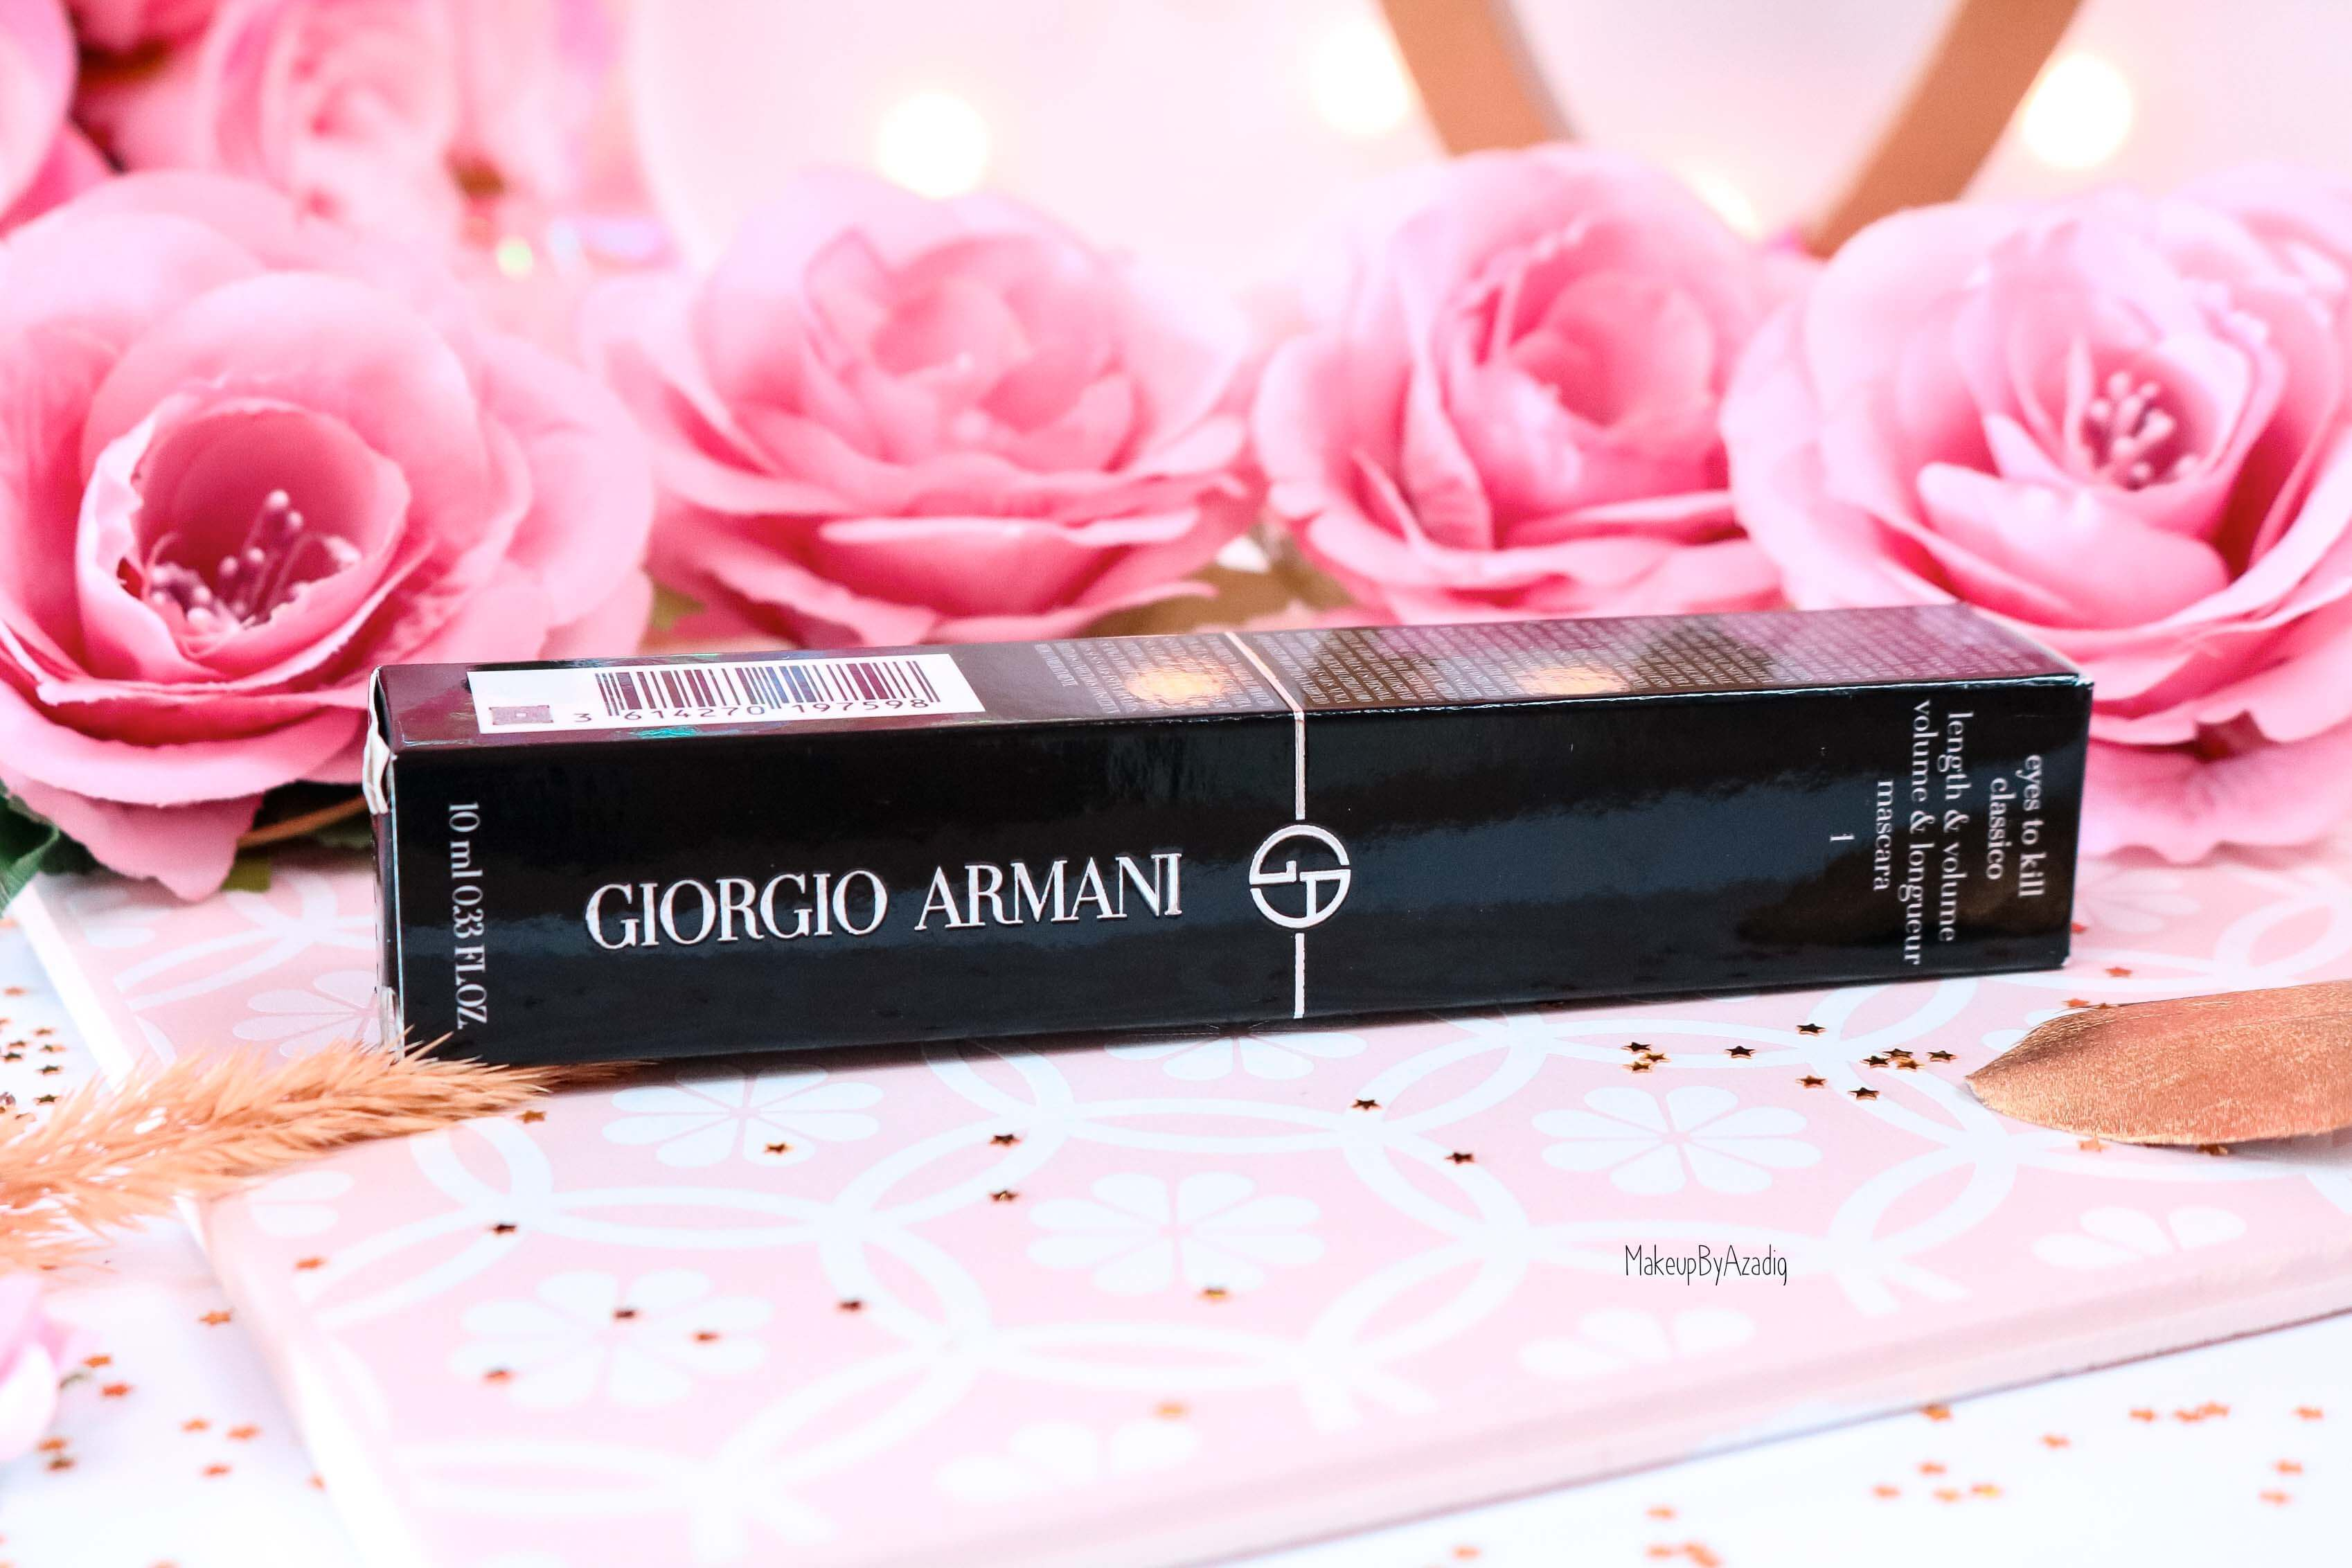 revue-meilleur-mascara-noir-giorgio-armani-eyes-to-kill-classico-volume-longueur-avis-prix-sephora-makeupbyazadig-packaging